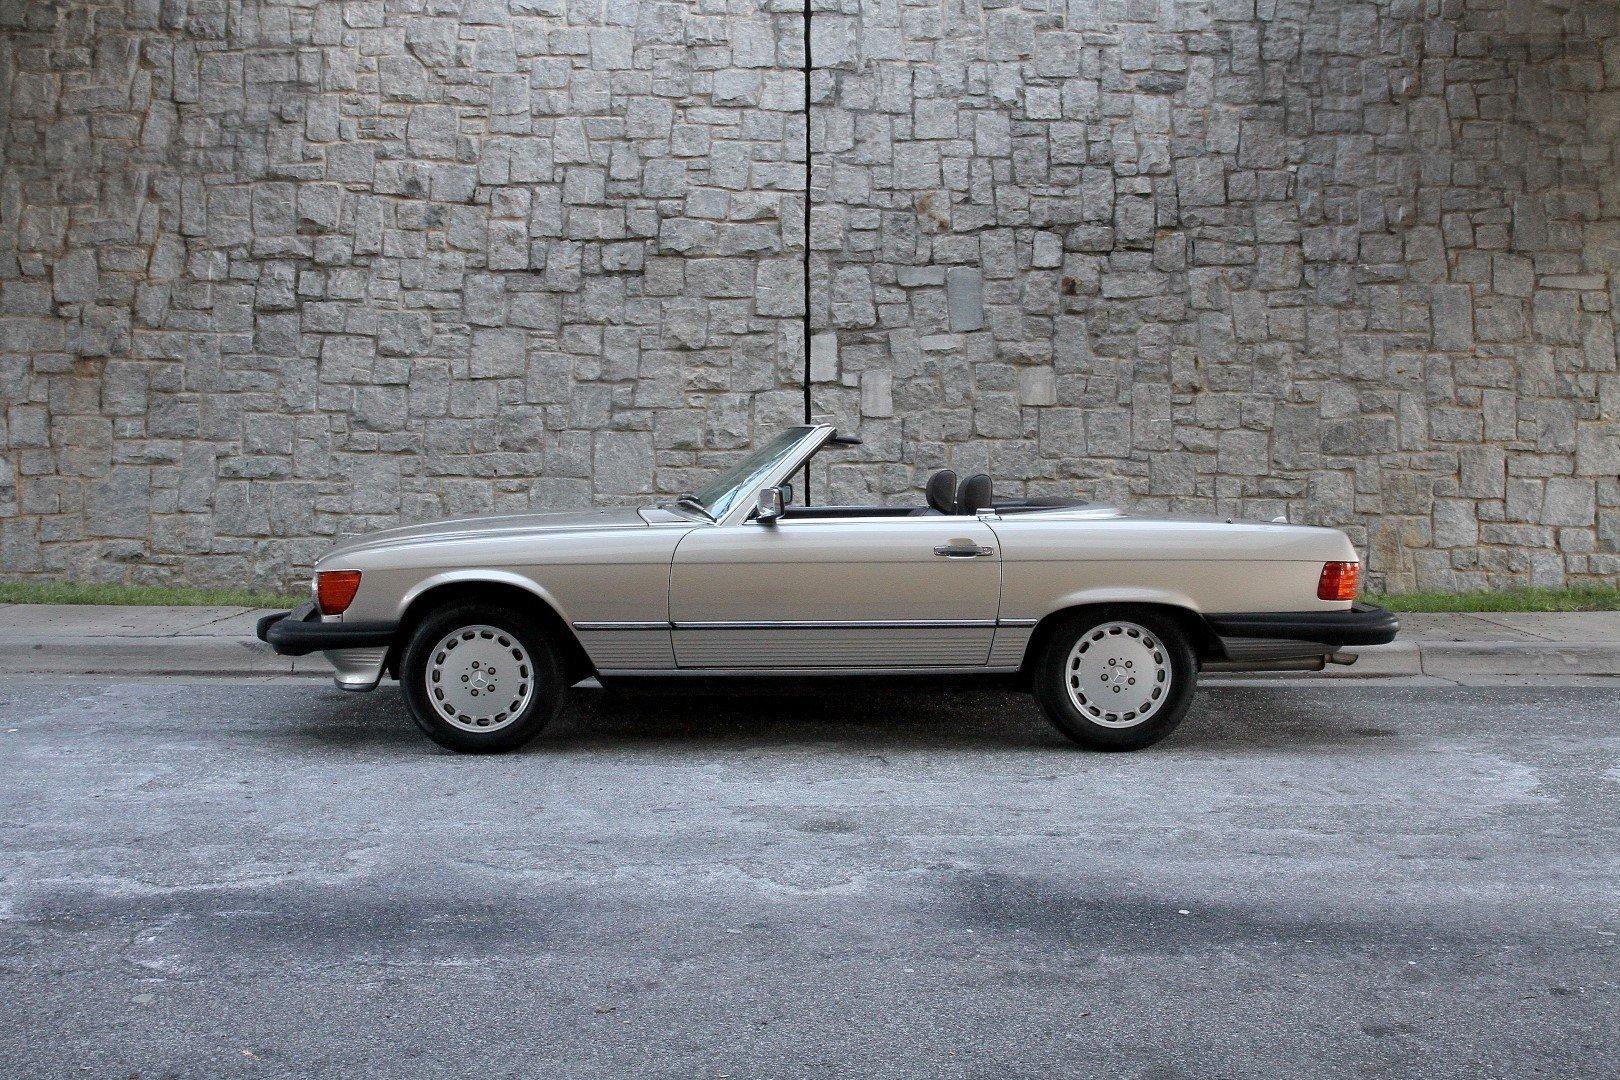 1988 Mercedes-Benz 560 SL for sale #78510 | MCG